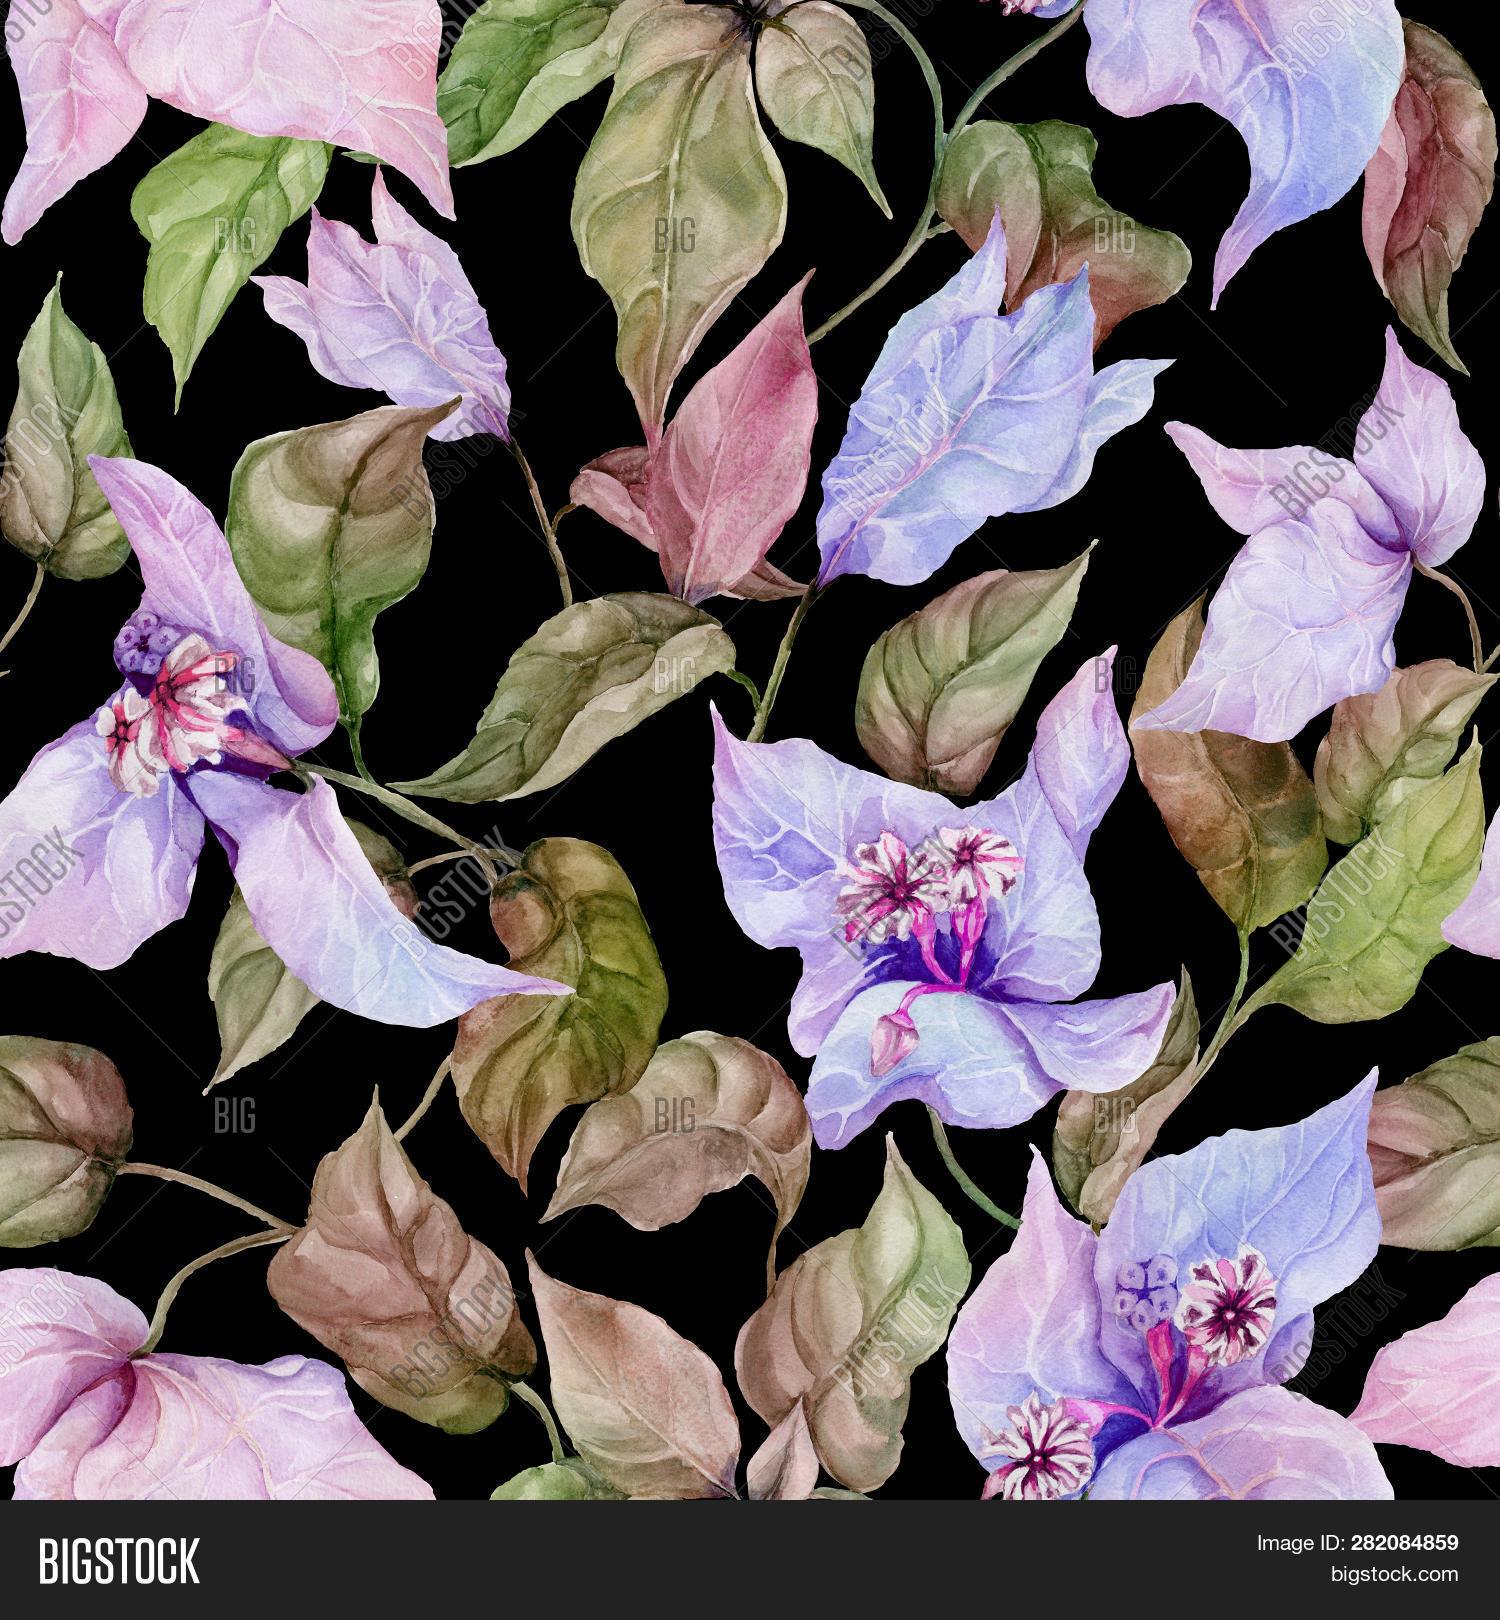 Beautiful Image Photo Free Trial Bigstock